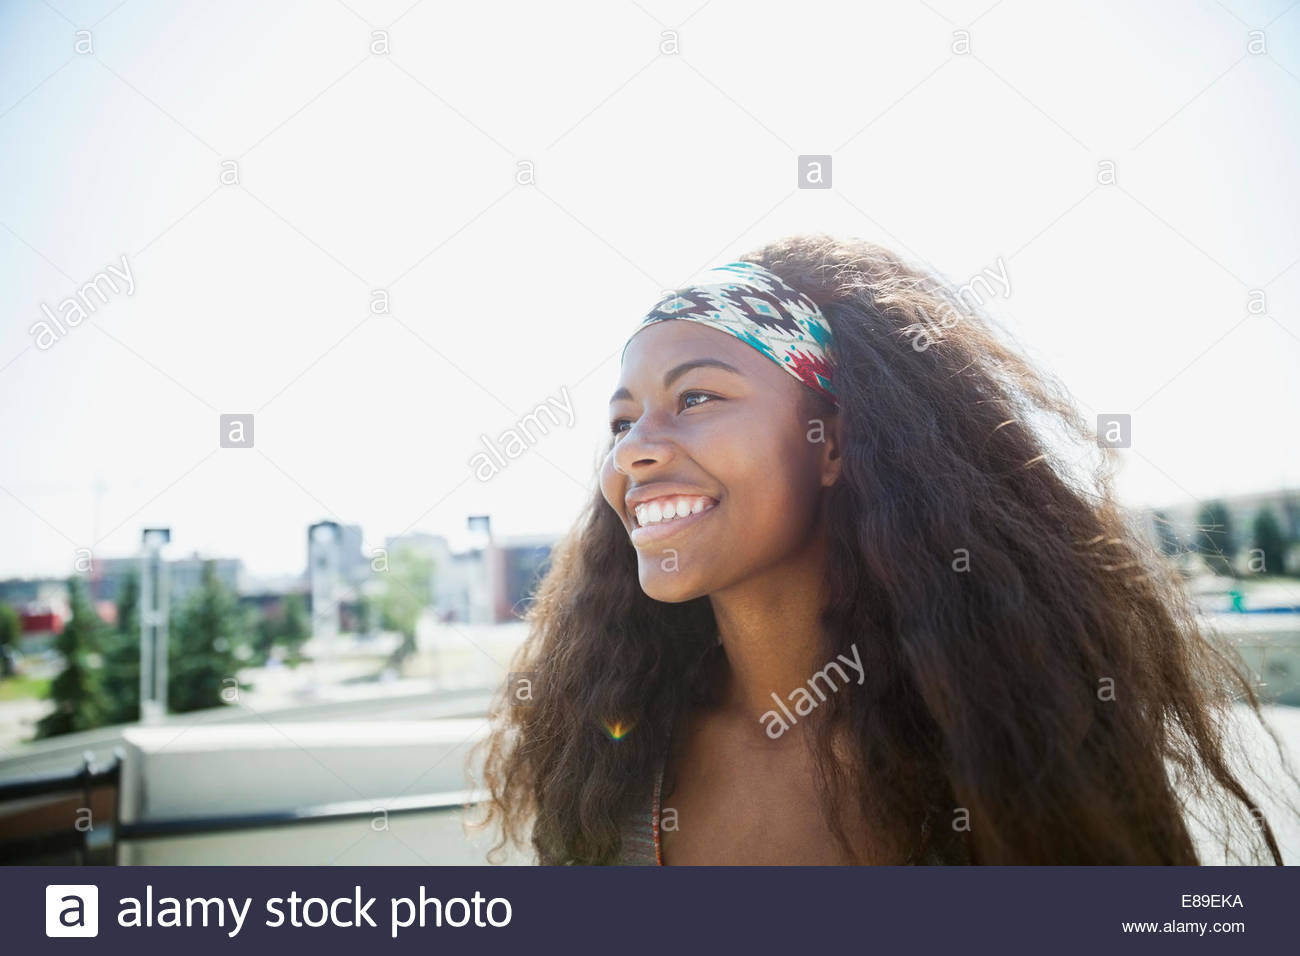 Teenager-Mädchen lächelnd im freien Stockbild